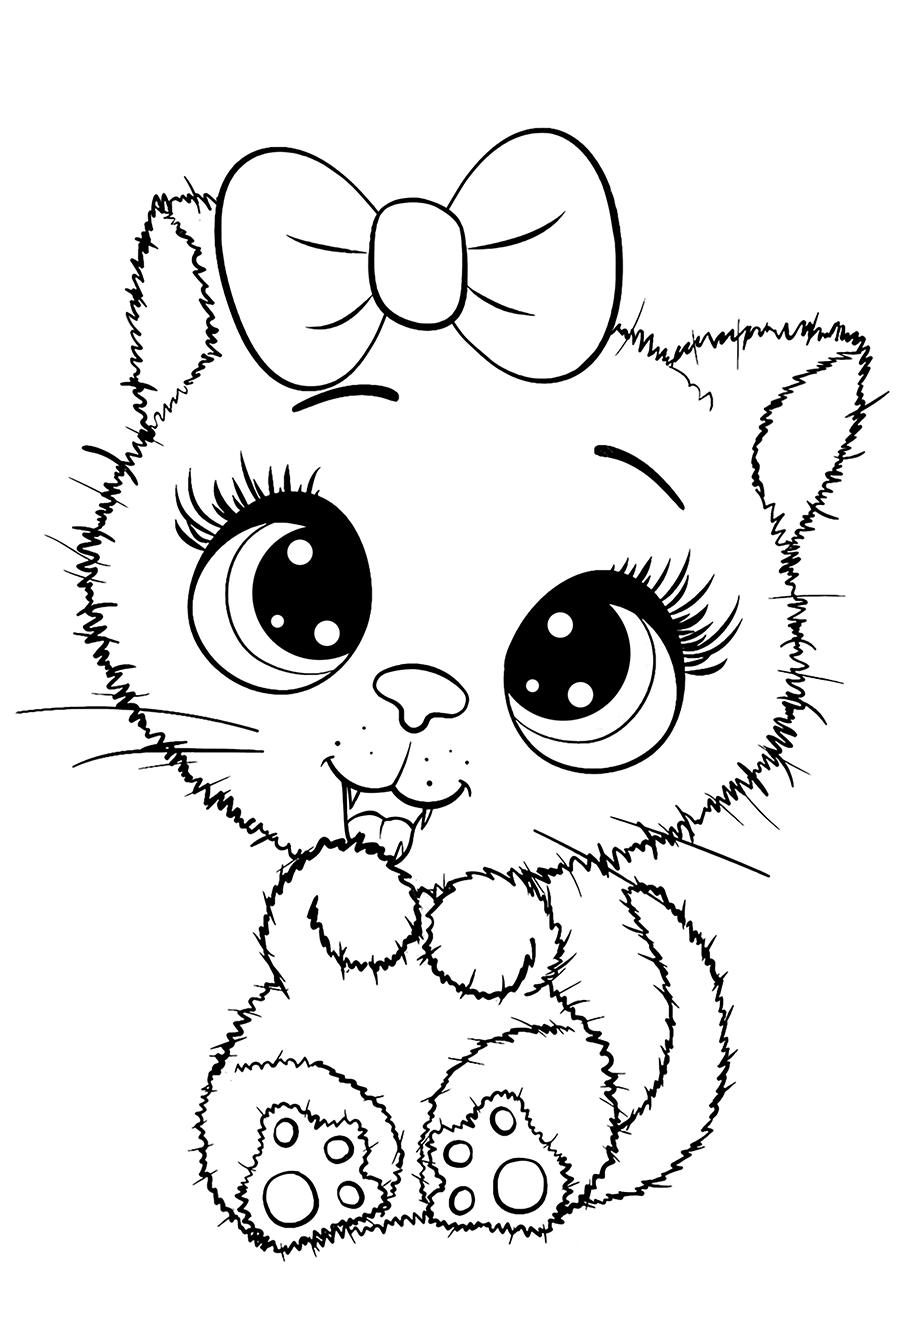 Кошечка - Милашки - Раскраски антистресс